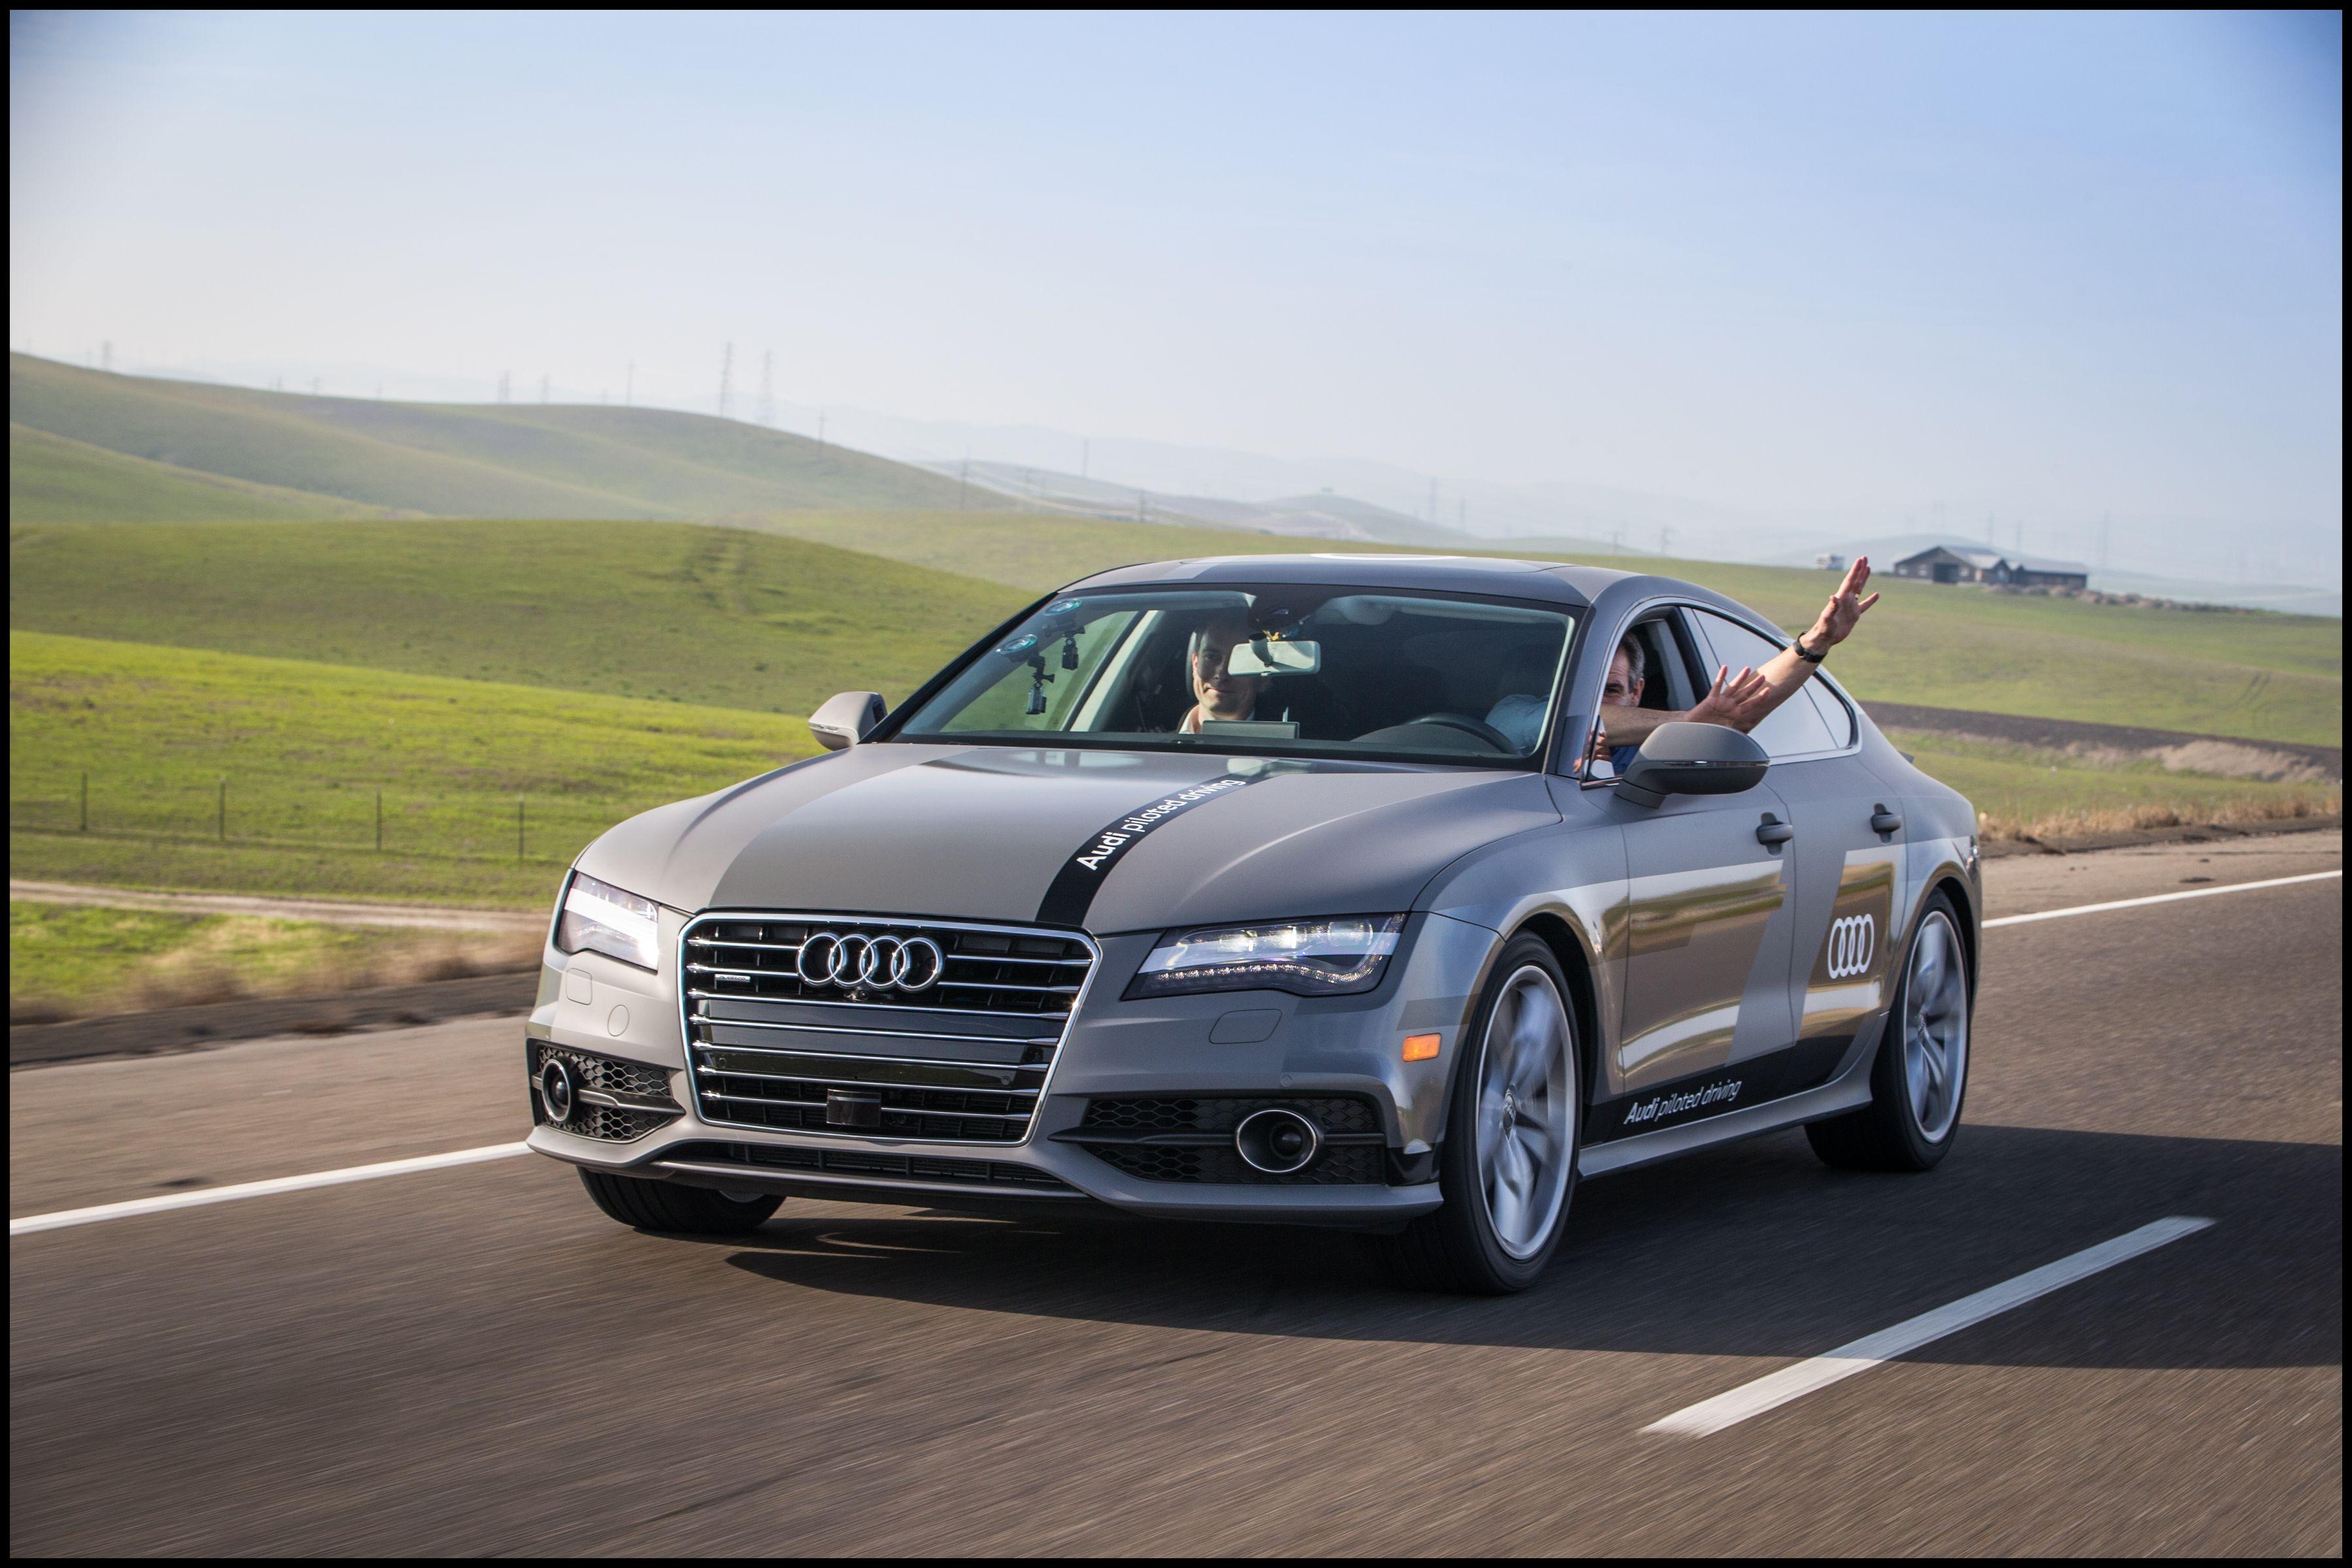 Update Audi s Self Driving Car Technology Jim Ellis Audi Marietta